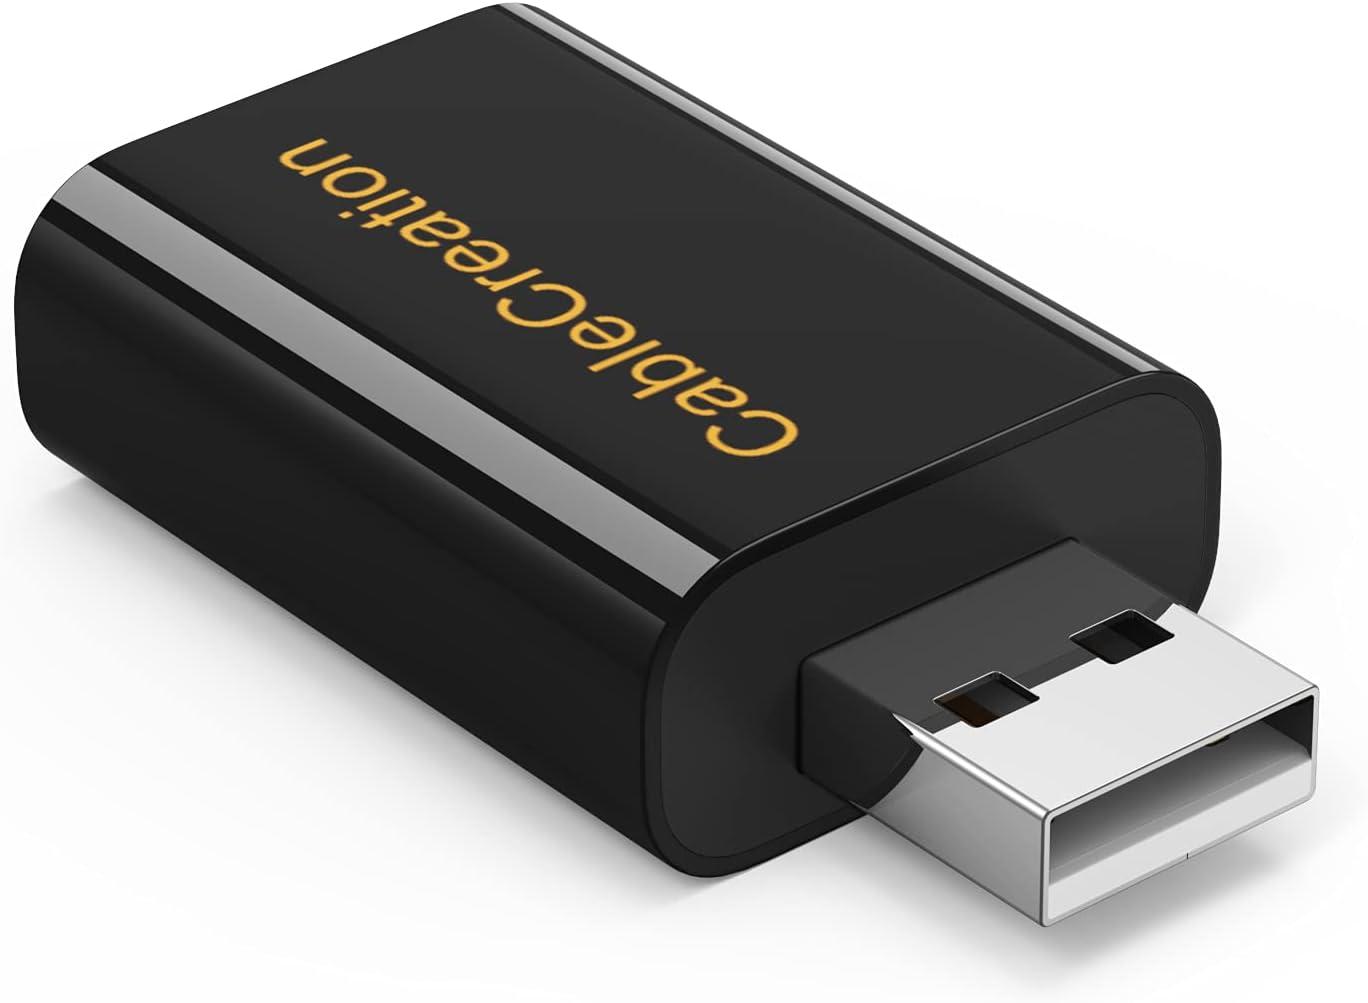 Best USB Audio Adapter